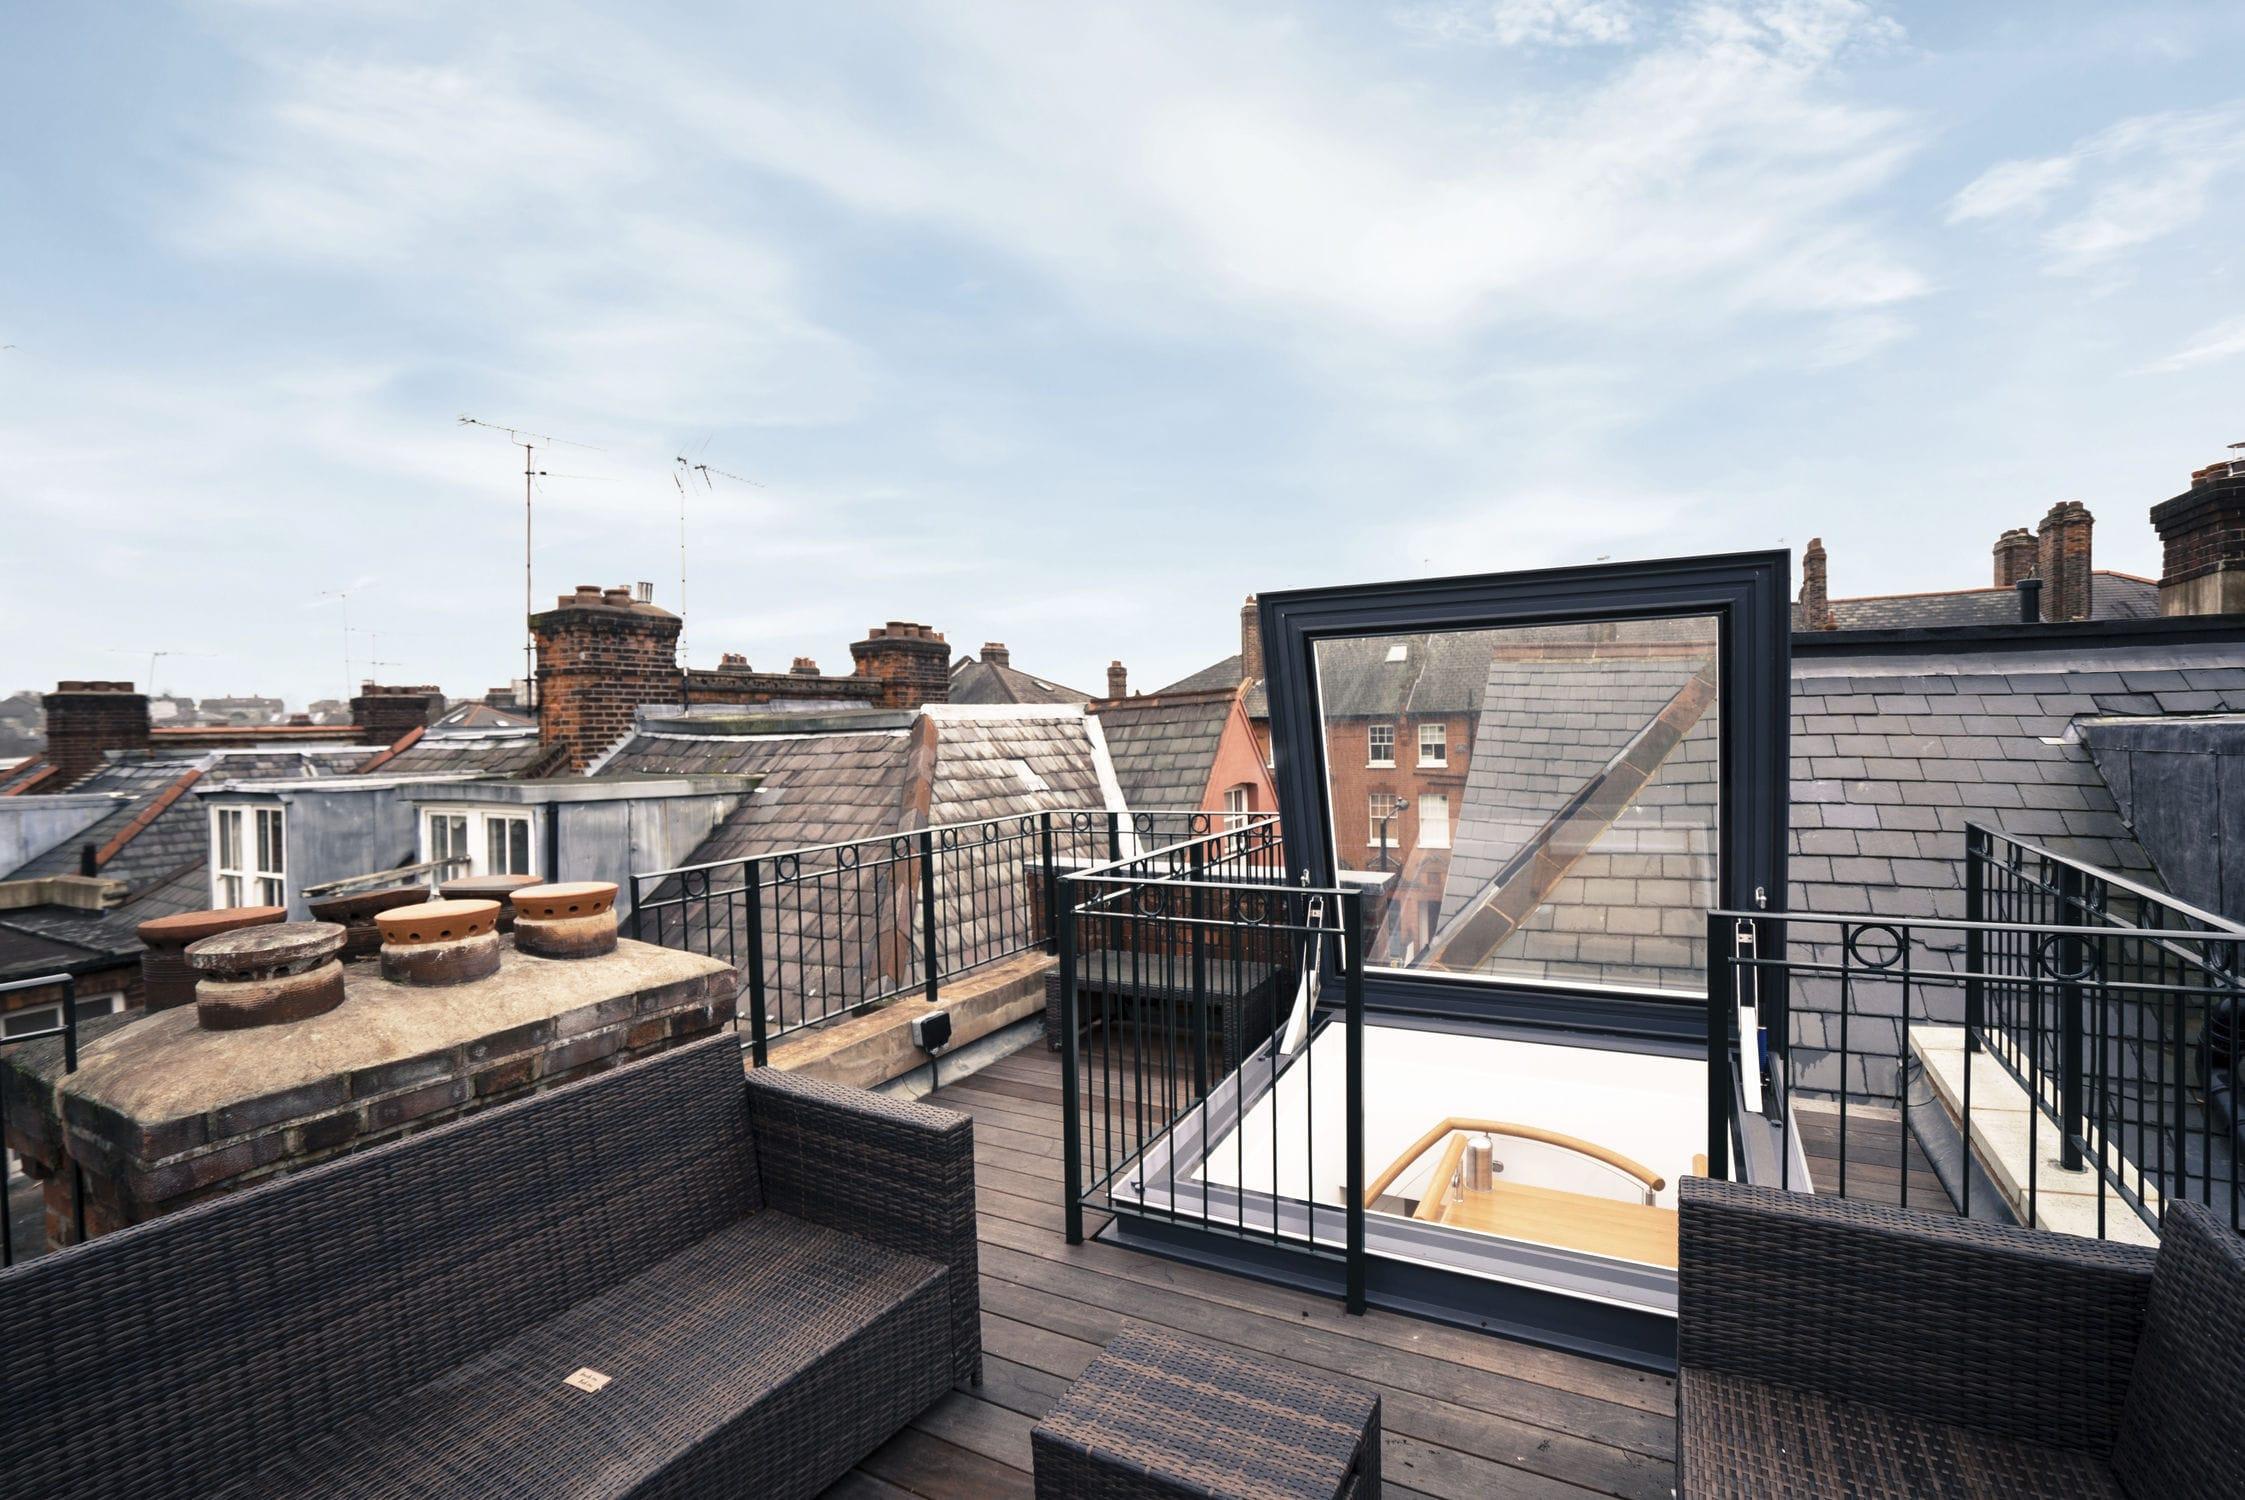 Rooftop Access Hatch / Square / Rectangular / Aluminum. GV SKYDOOR  (electric) Glazing Vision